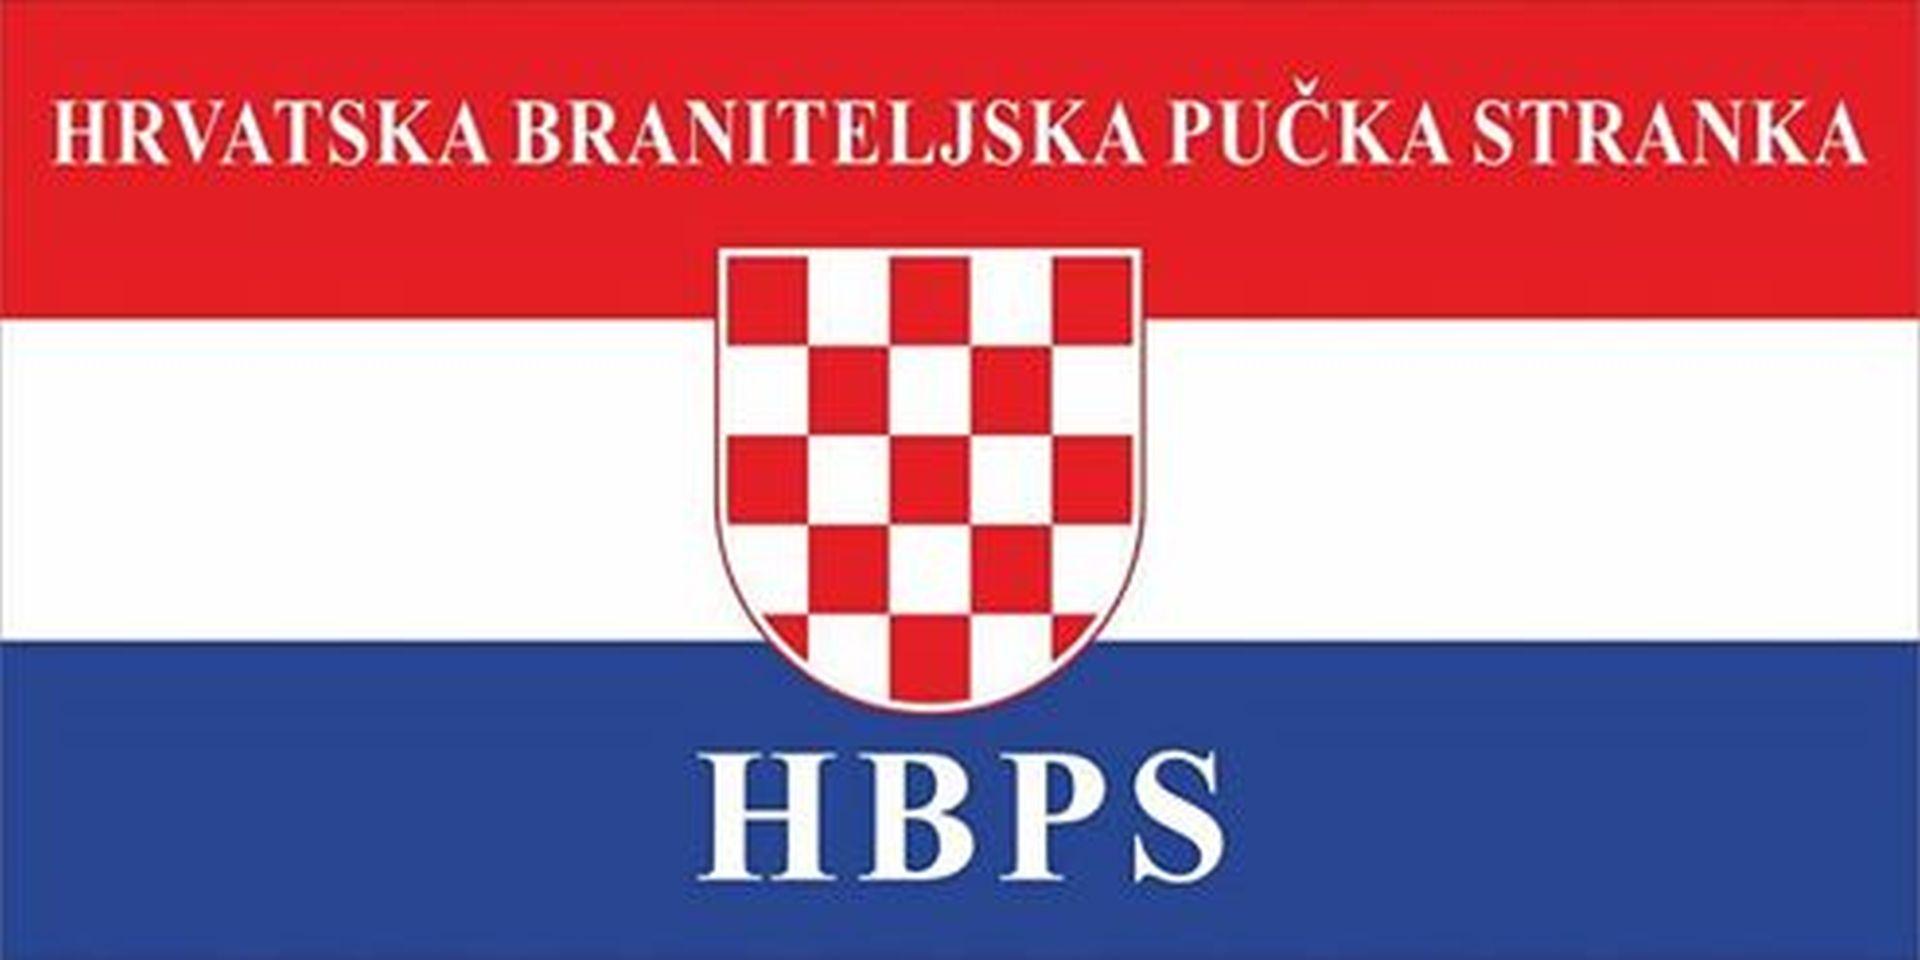 Osnovana Hrvatska braniteljska pučka stranka (HPBS)